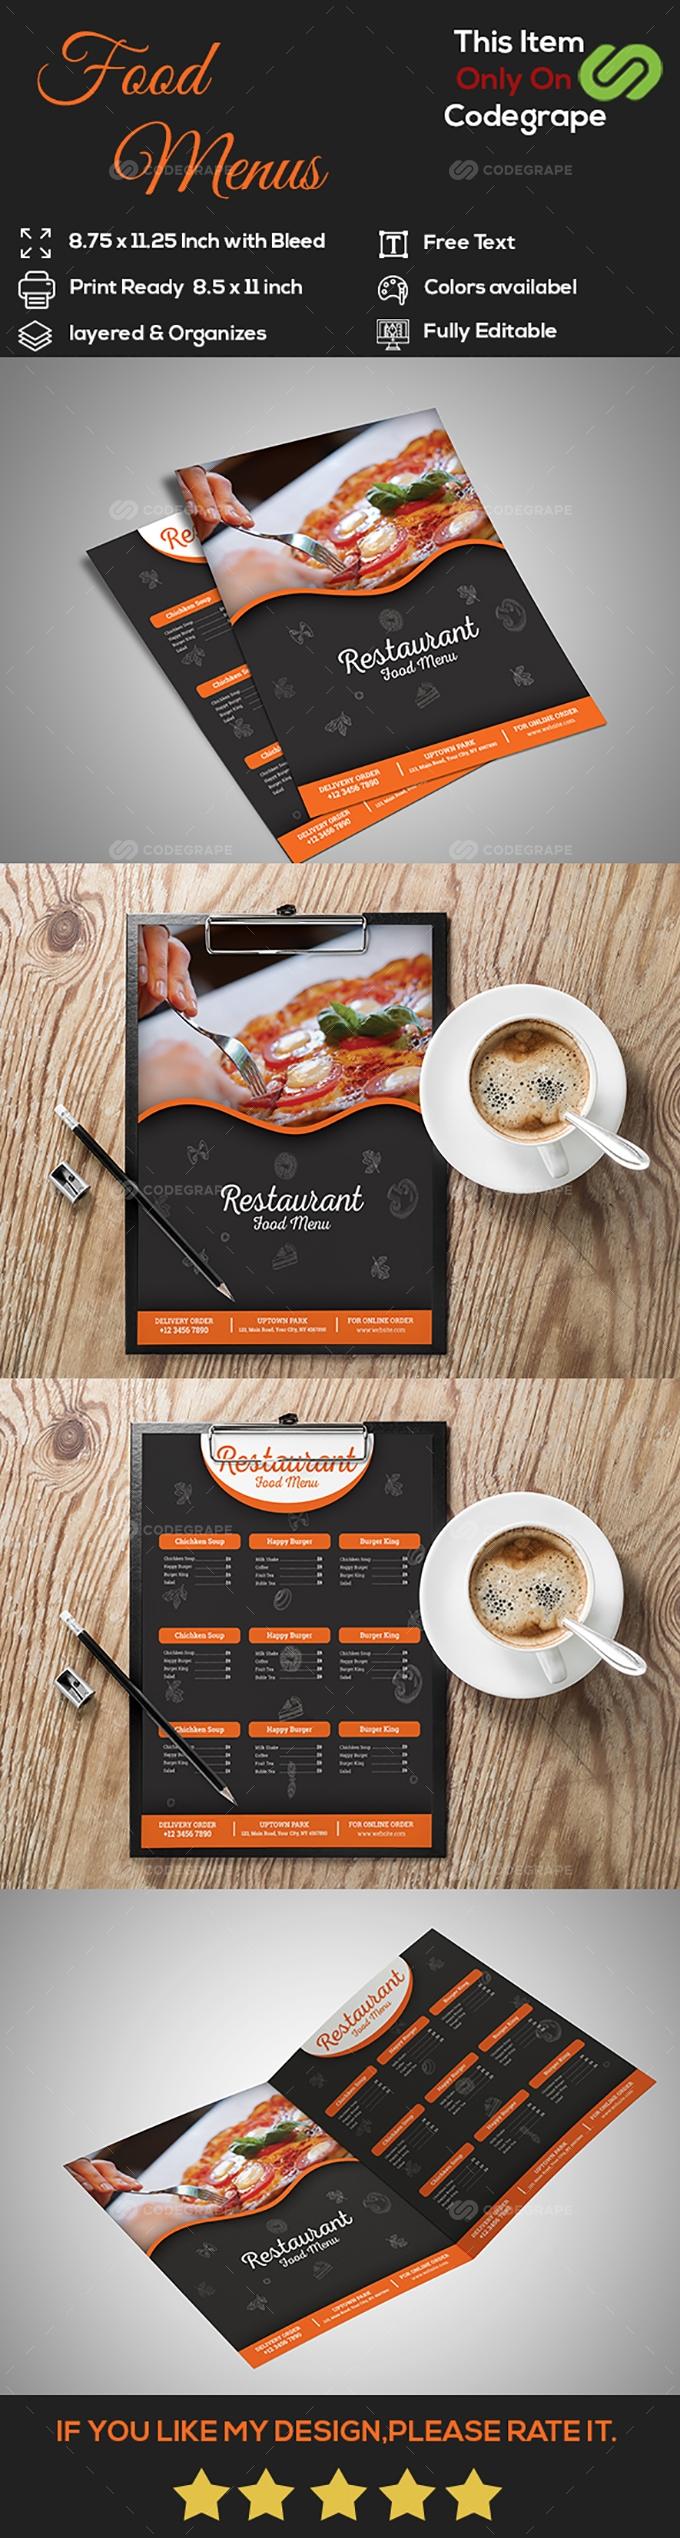 Restaurant/Food Menu